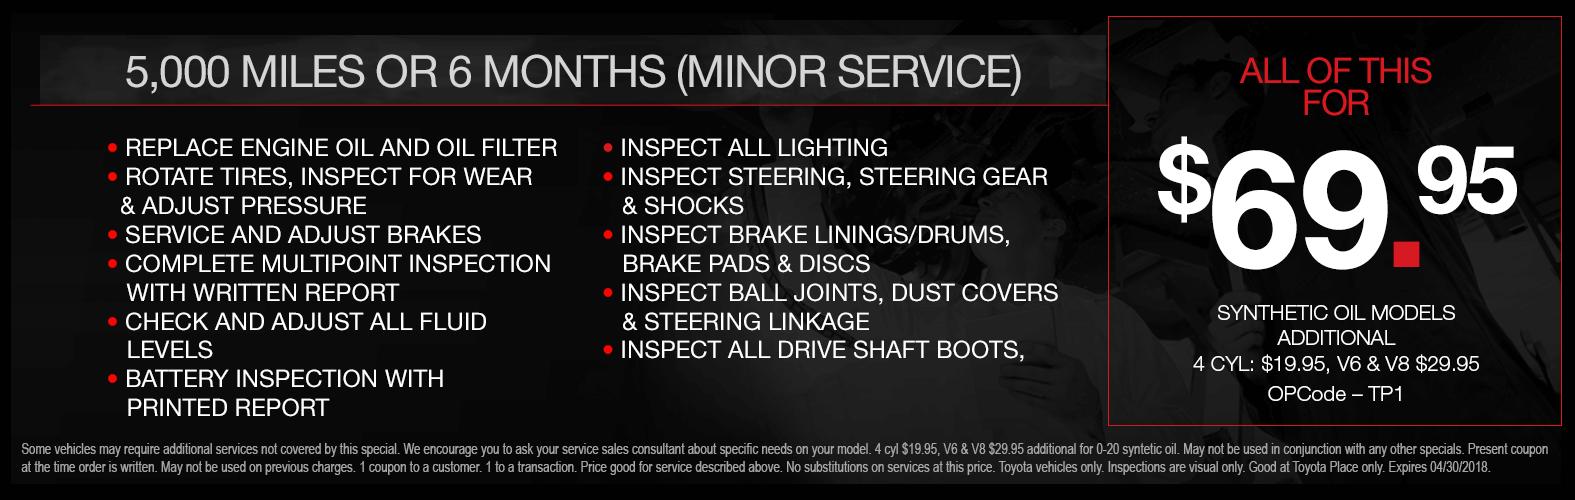 Toyota Minor Service Special